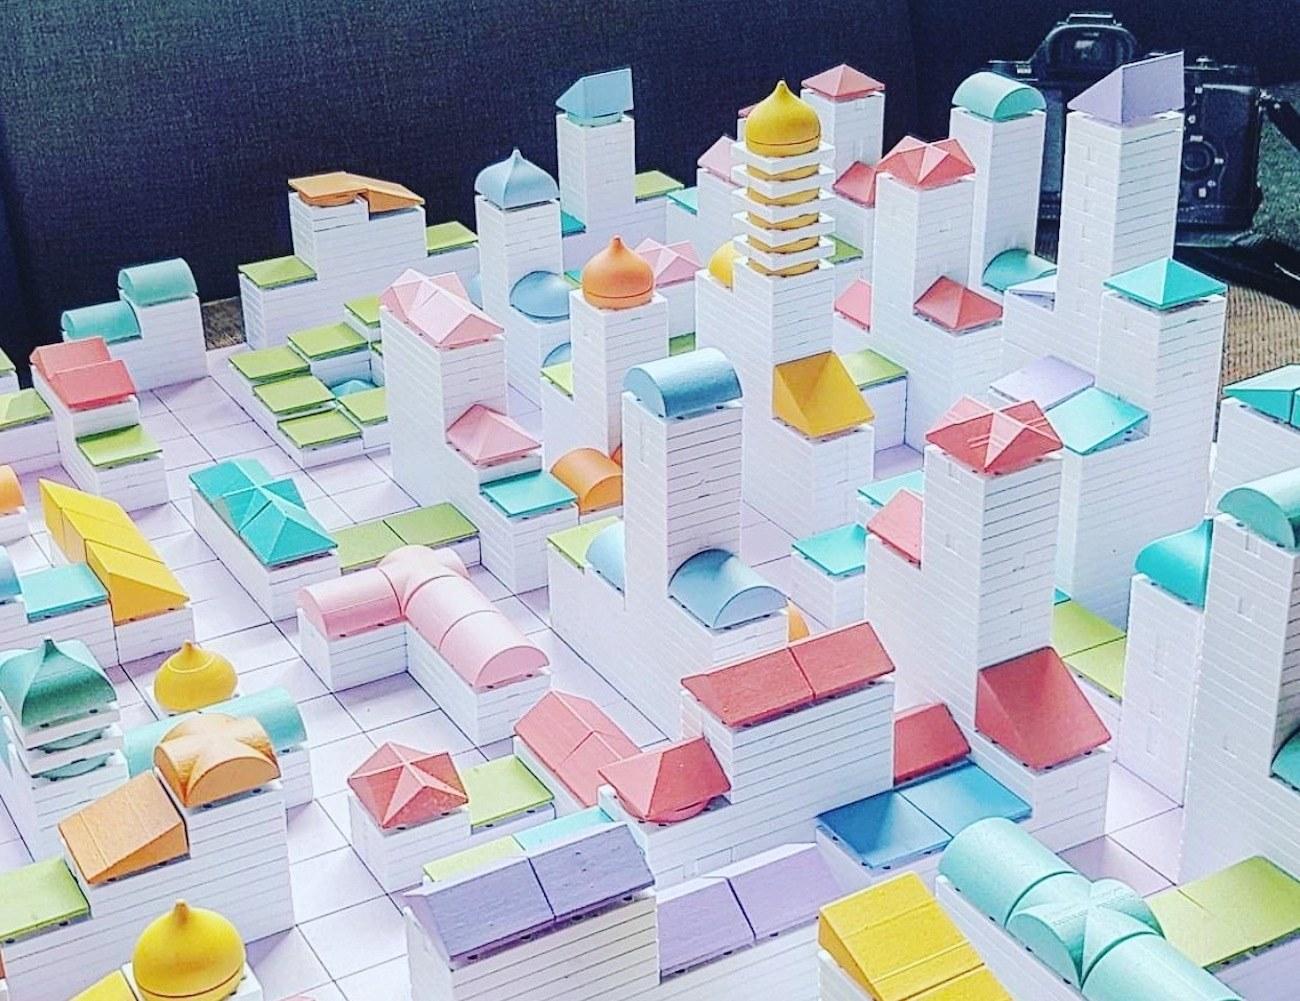 Arckit Modelling Building Blocks